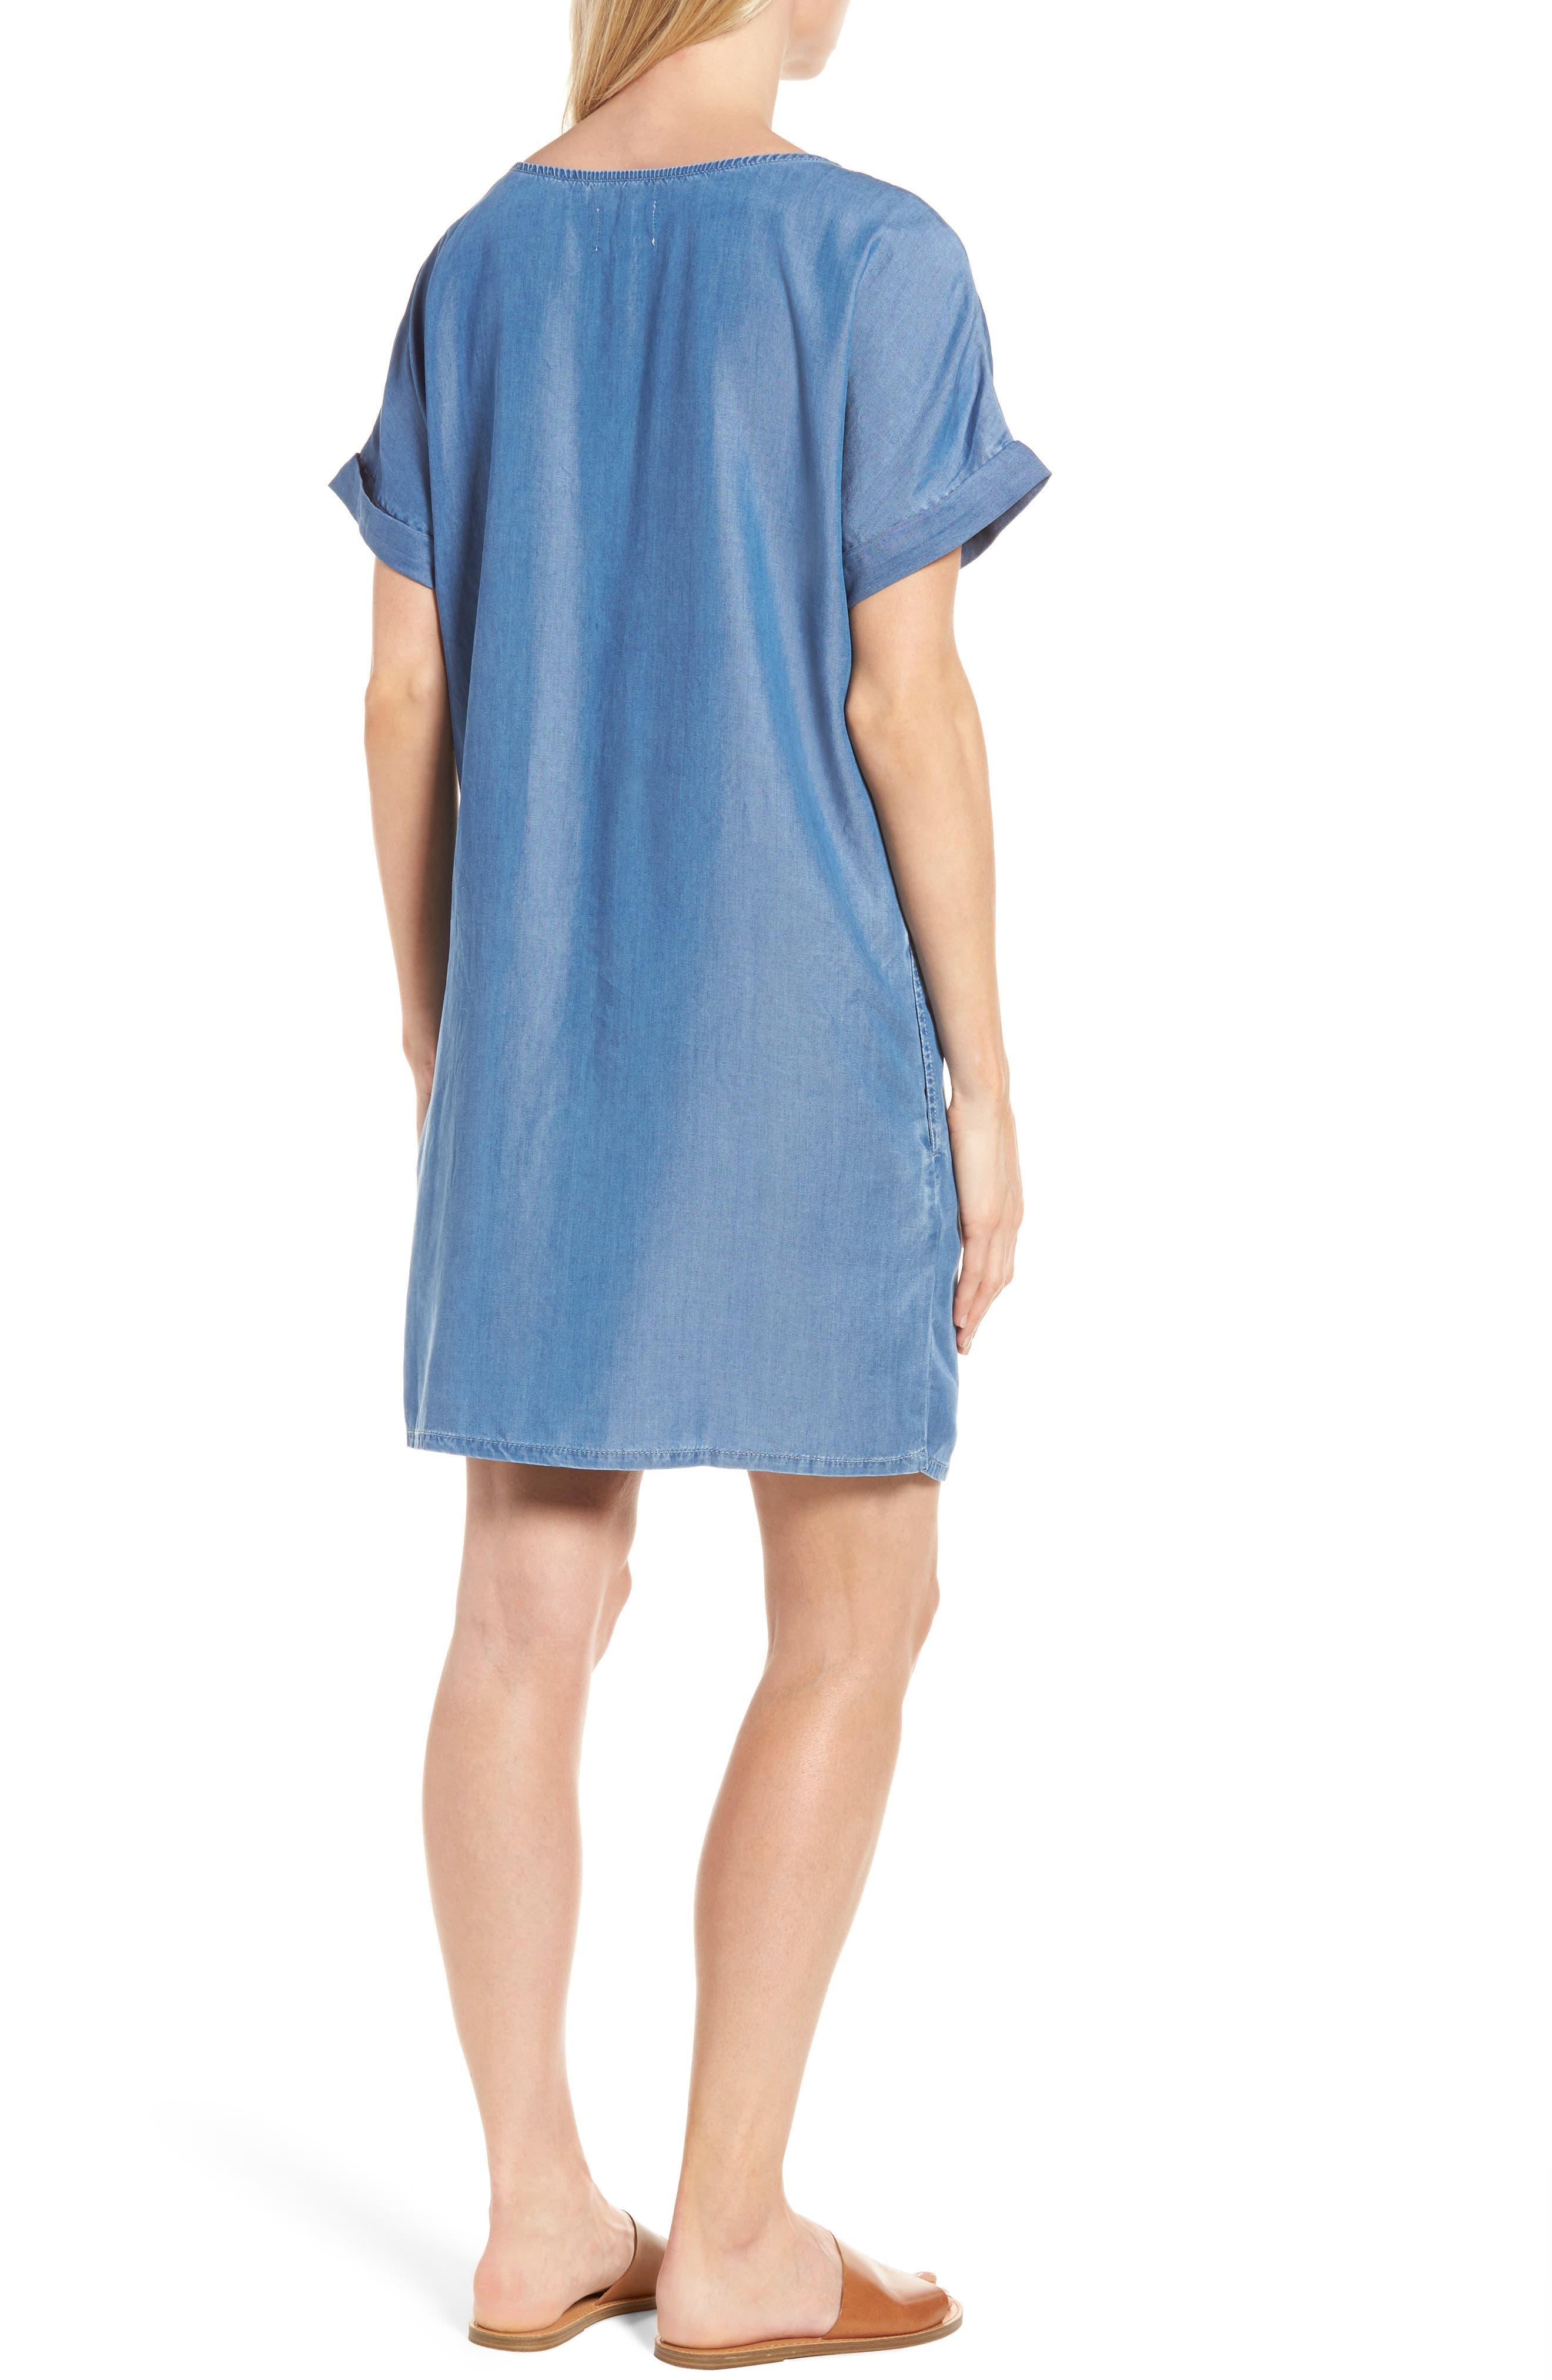 Alternate Image 2  - Caslon® Lace-Up Shift Dress (Regular & Petite)